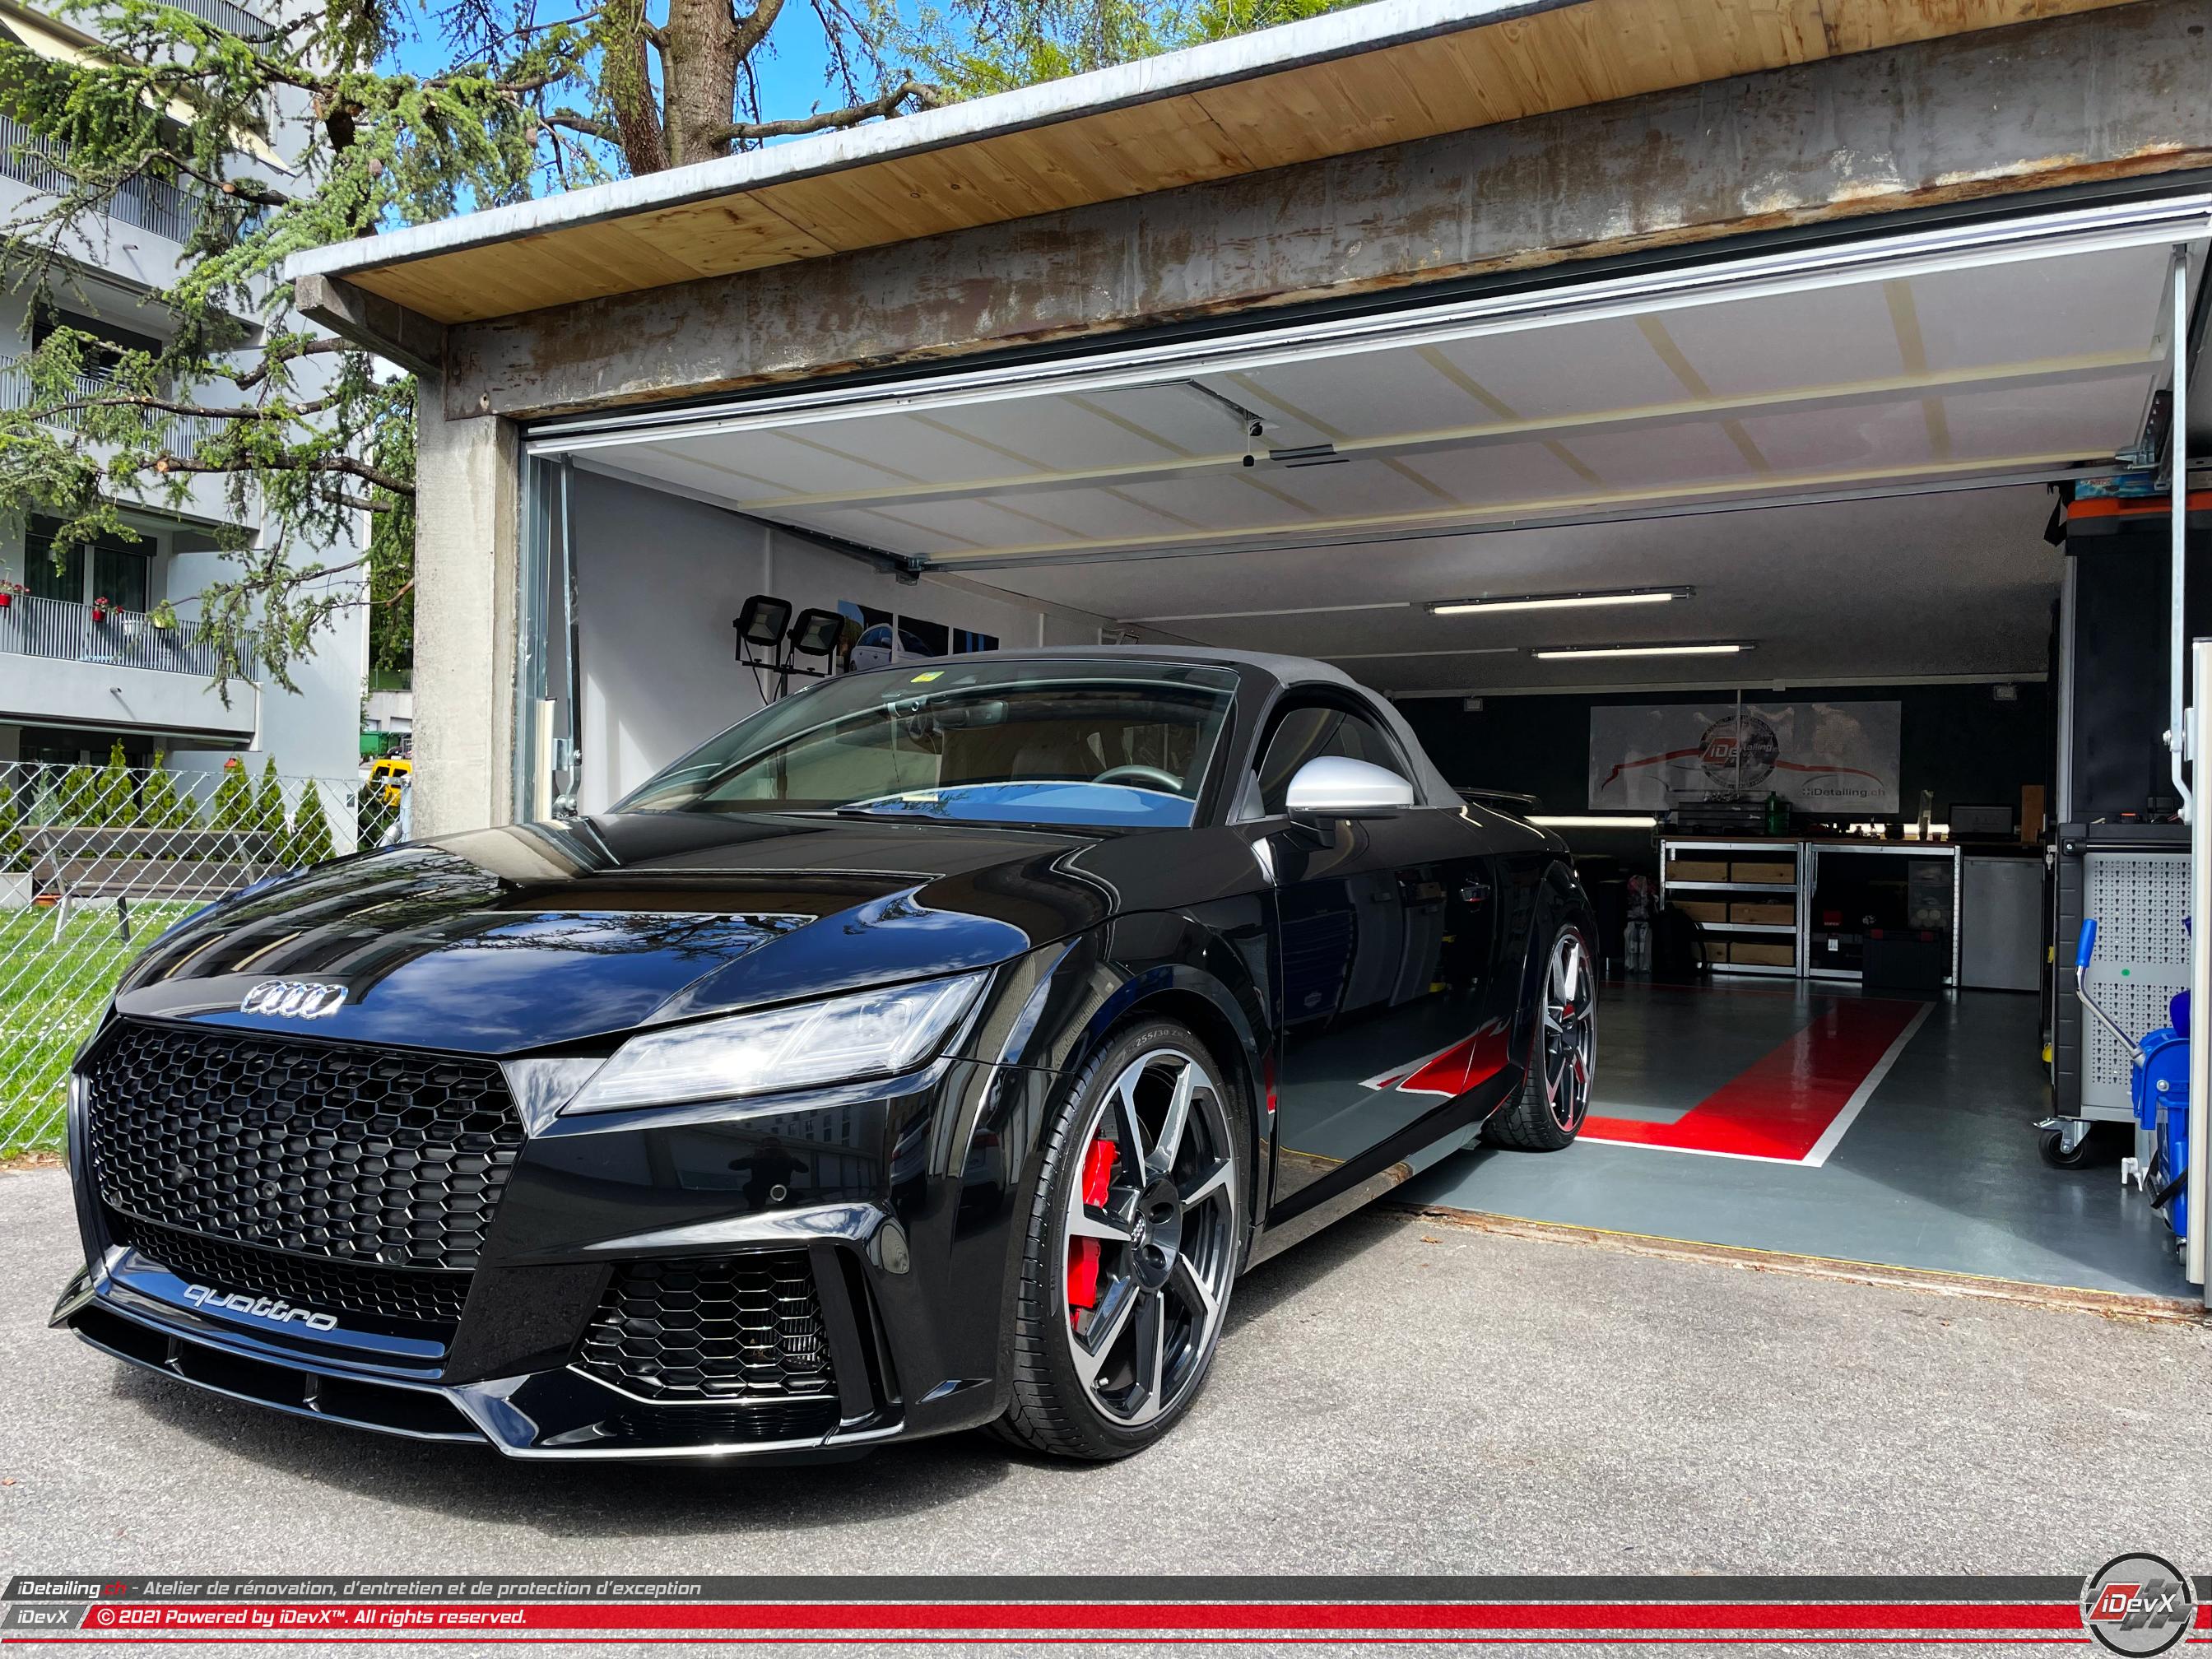 14_05.2021_Audi-TTRS_iDevX_021.png